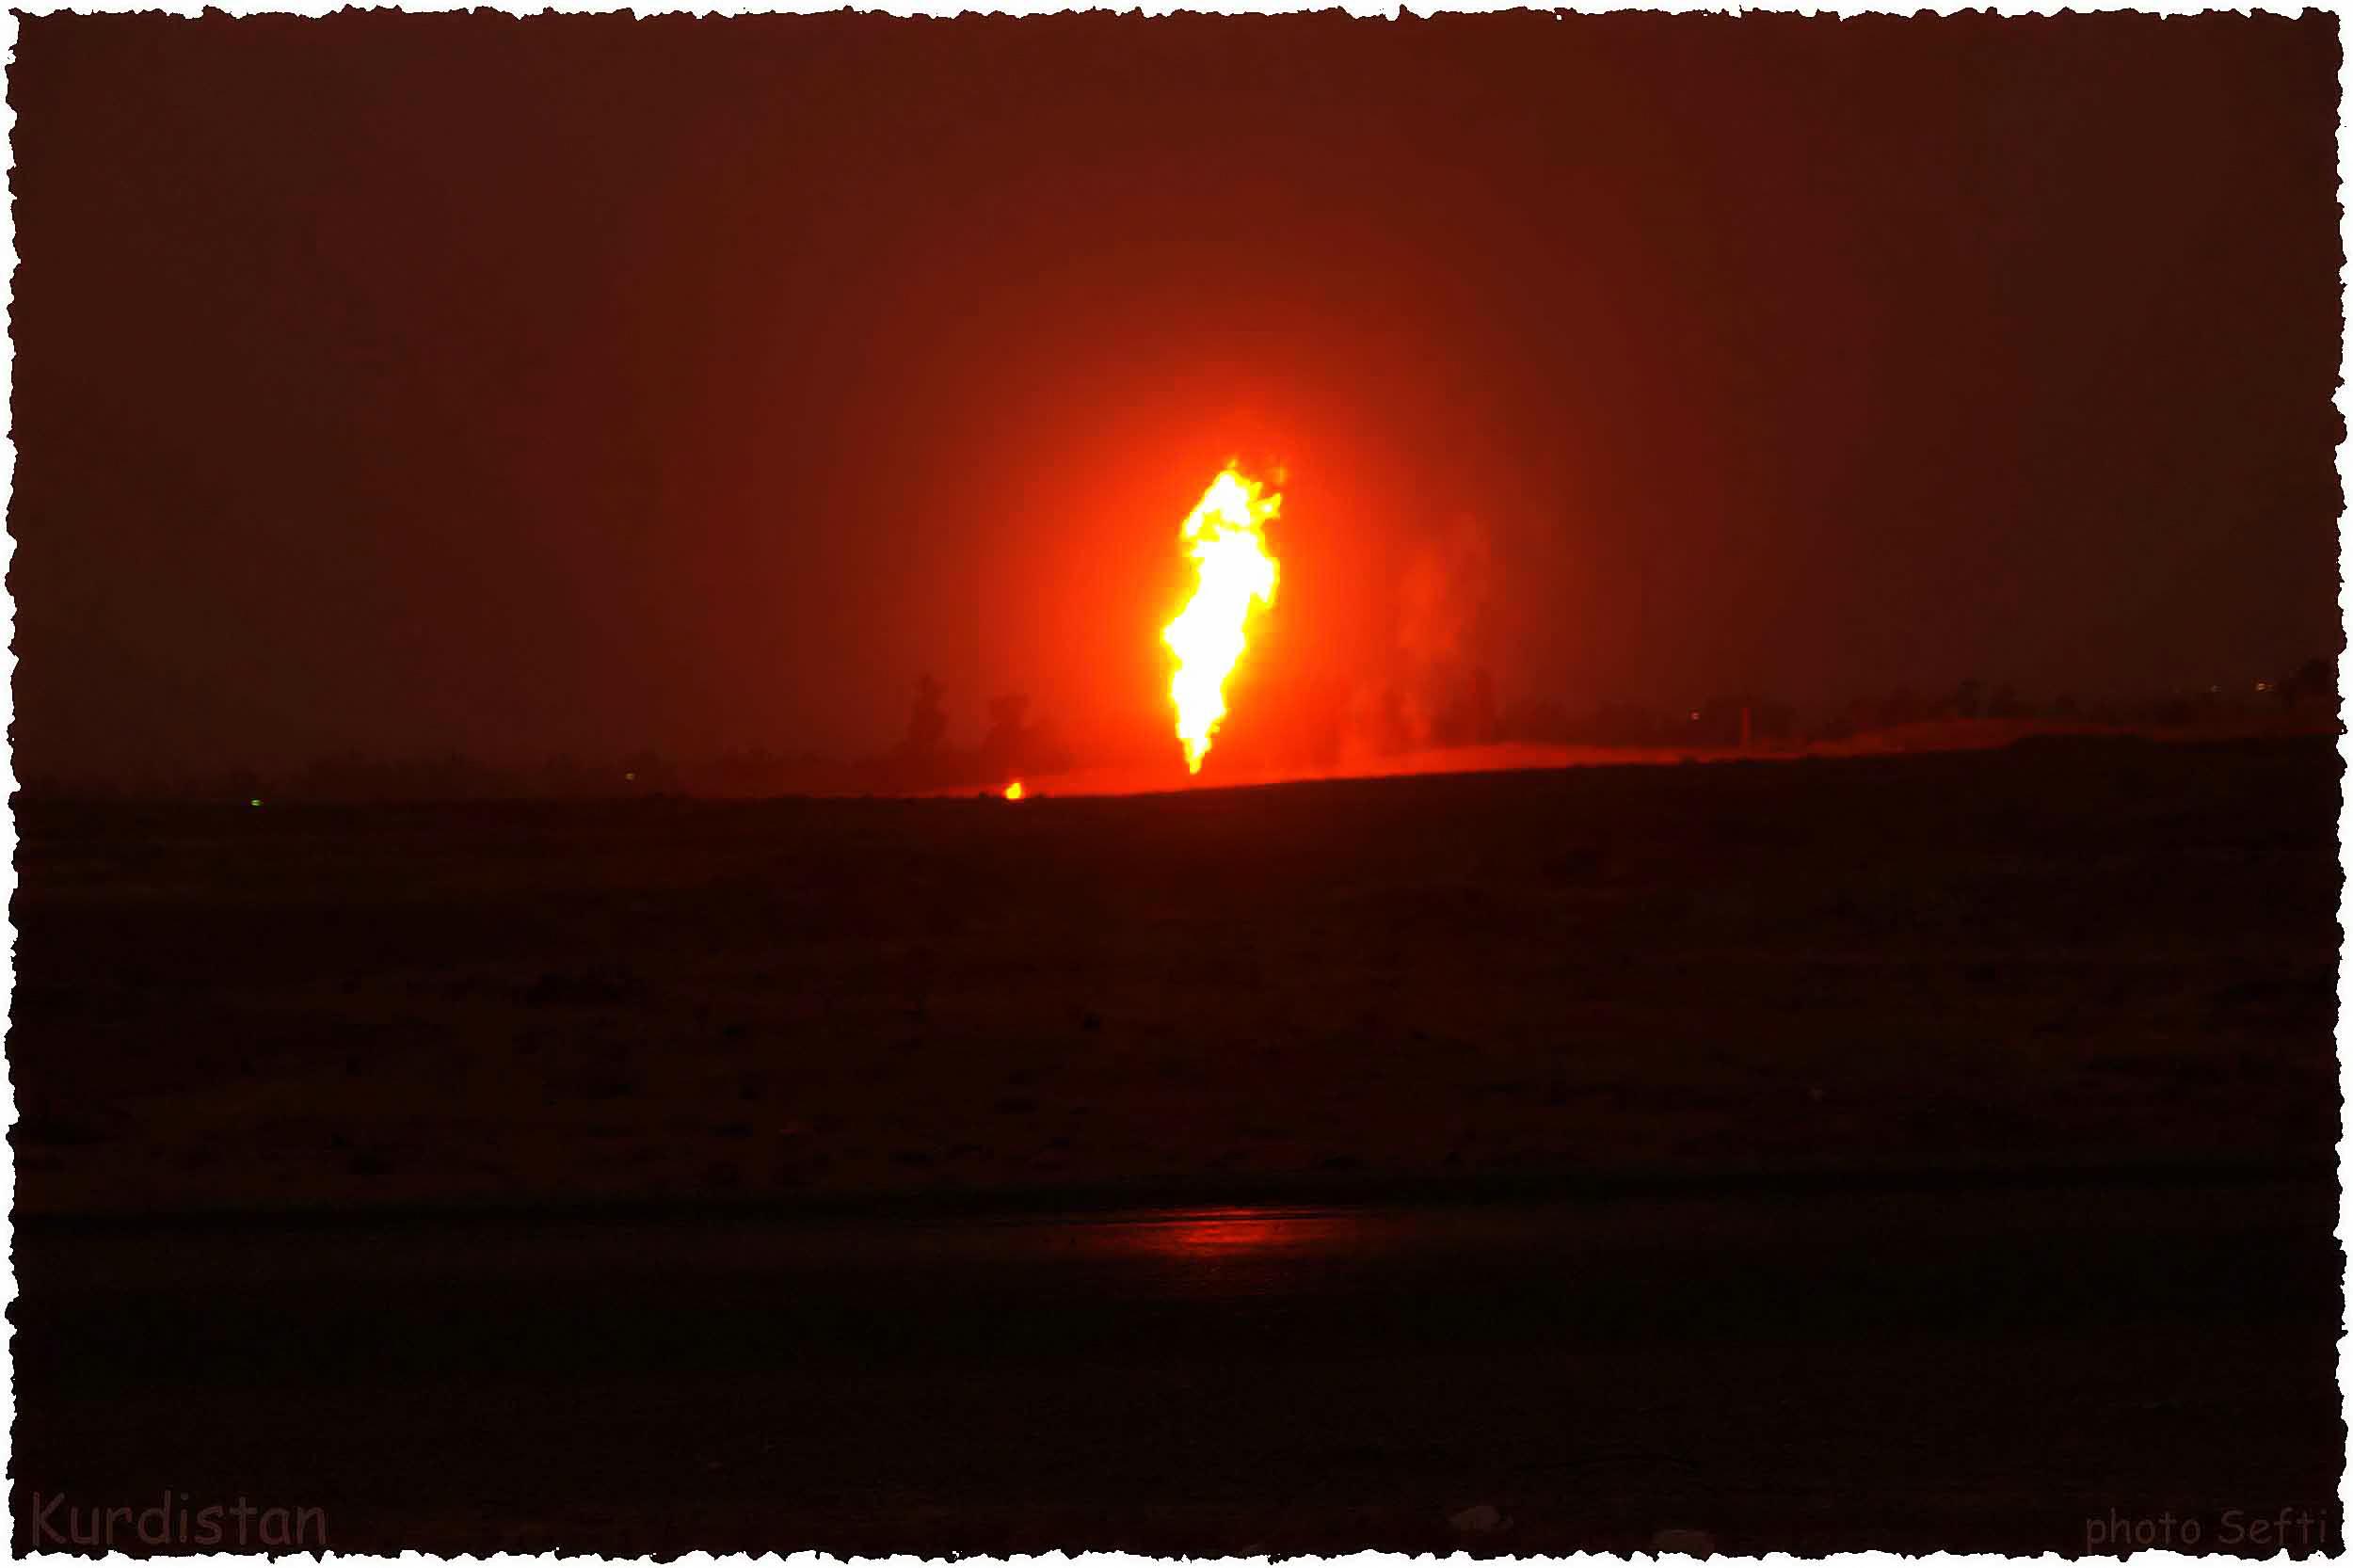 Caption: Karkuk kurdistan Oil, Credit: Jan Sefti